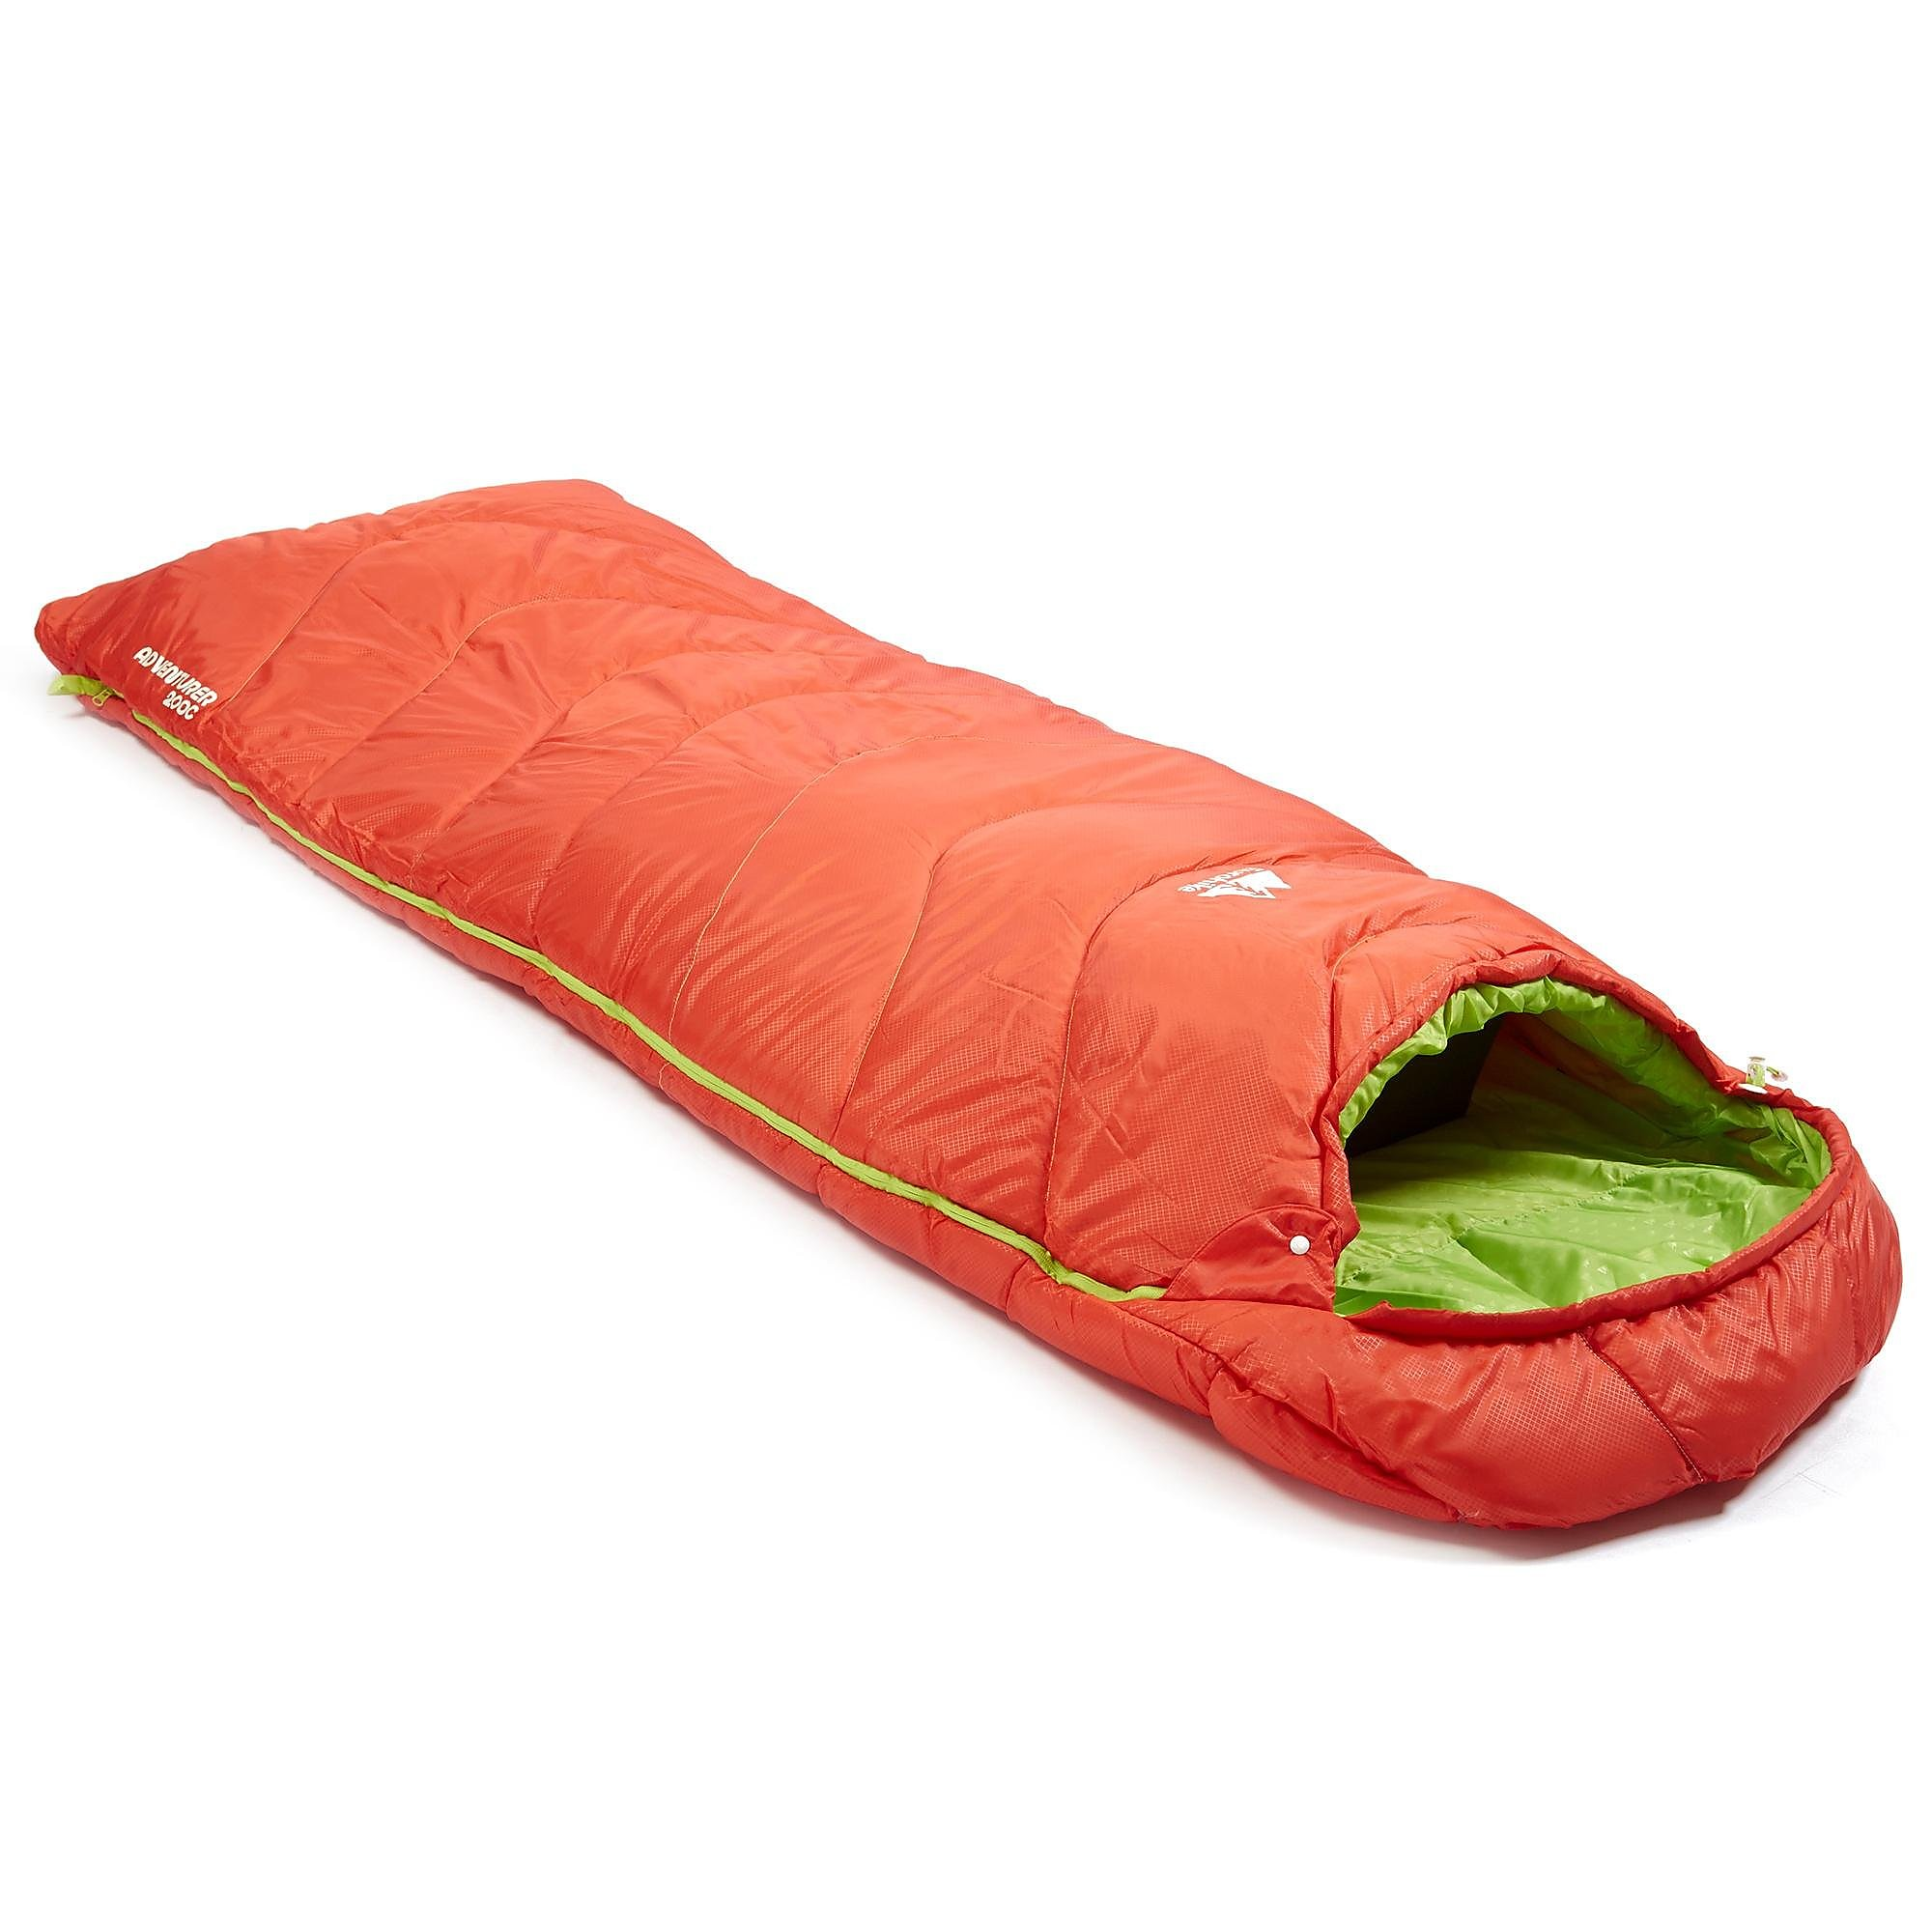 EUROHIKE Adventurer 200C Sleeping Bag